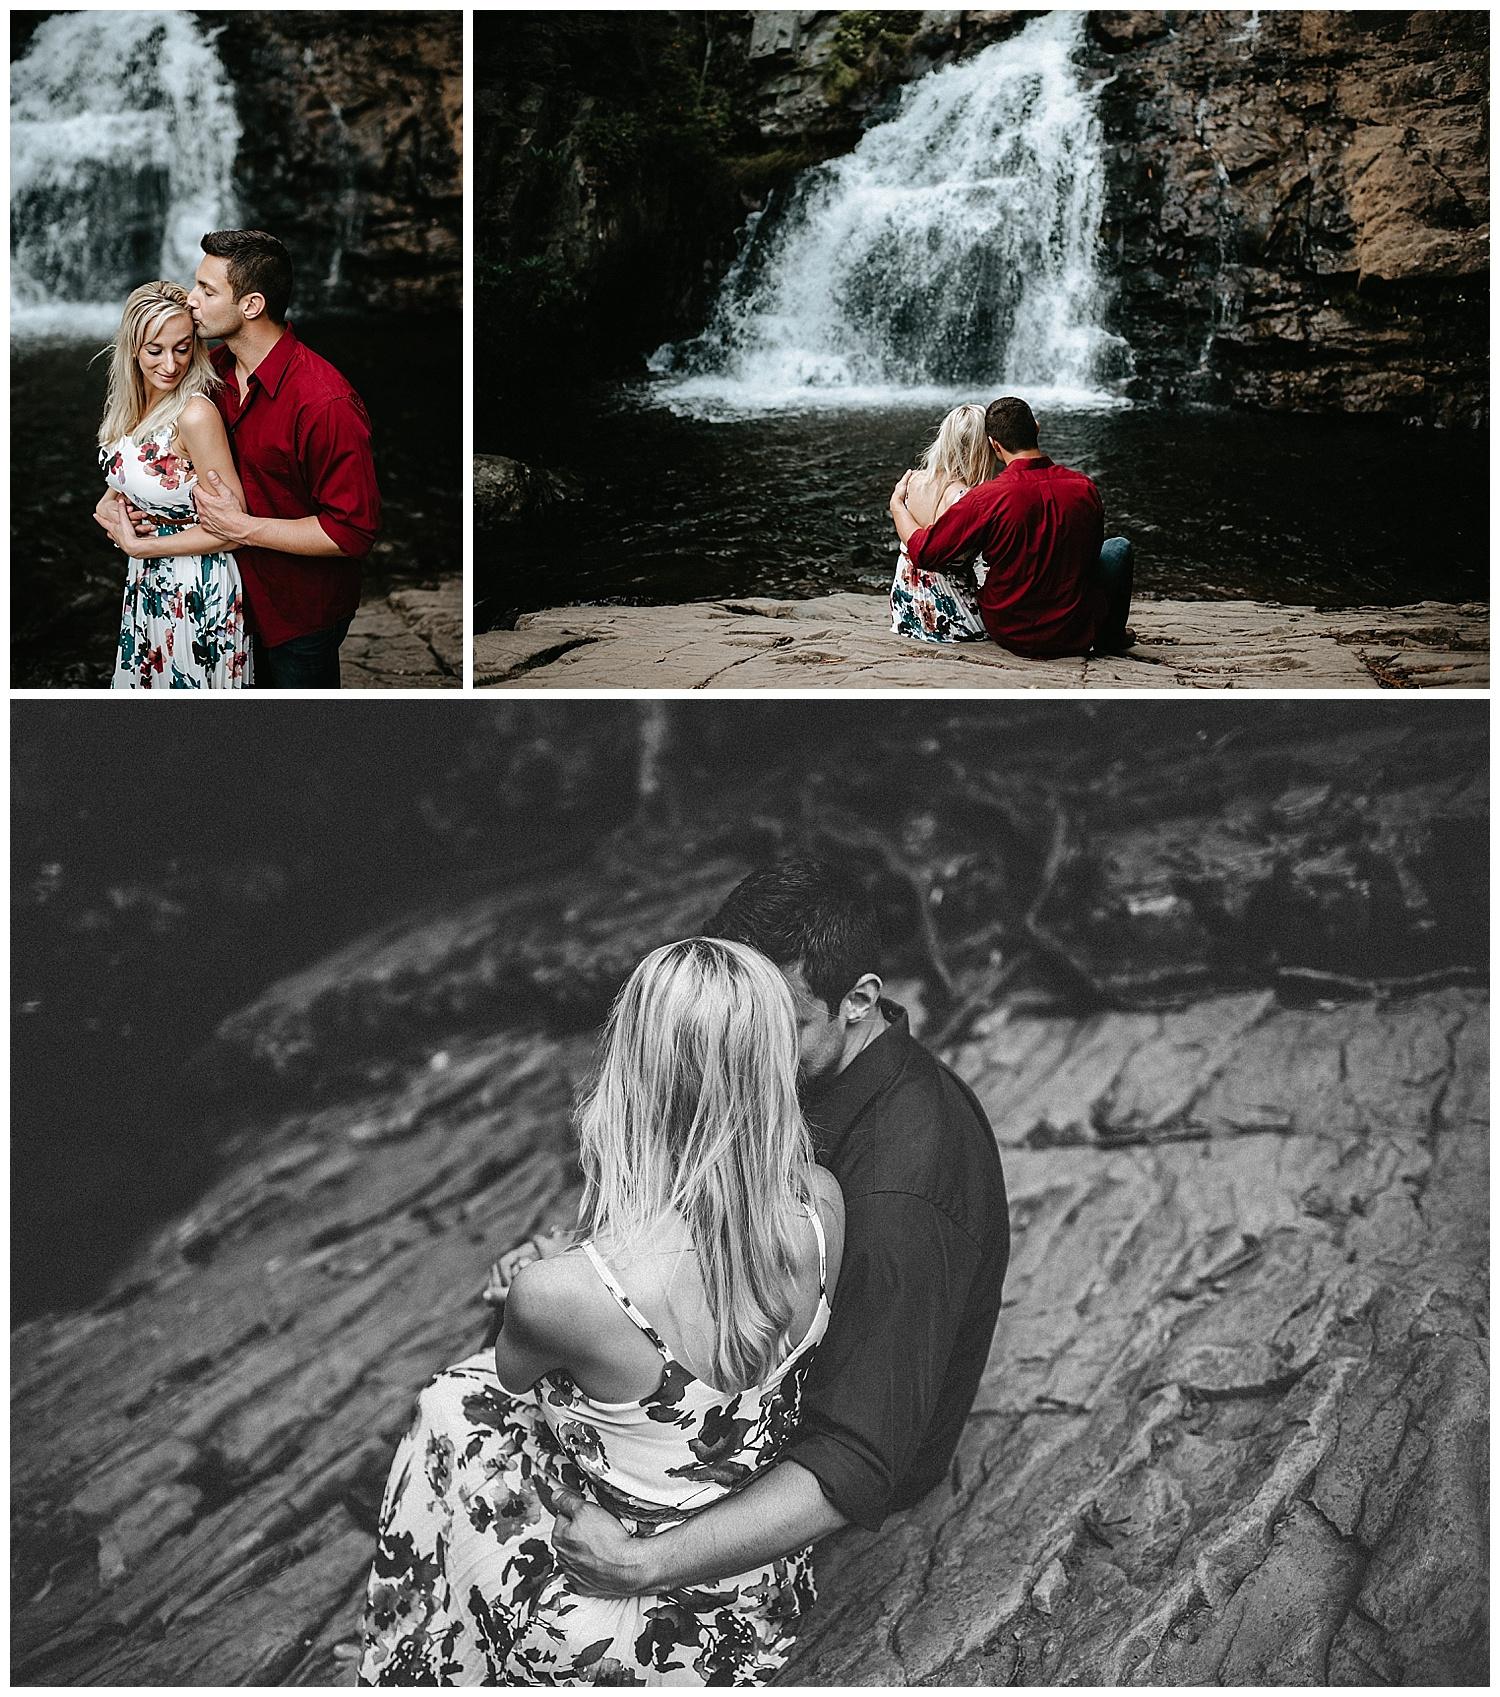 NEPA-Wedding-Engagement-Photographer-at-Hickory-Run-state-park_0014.jpg